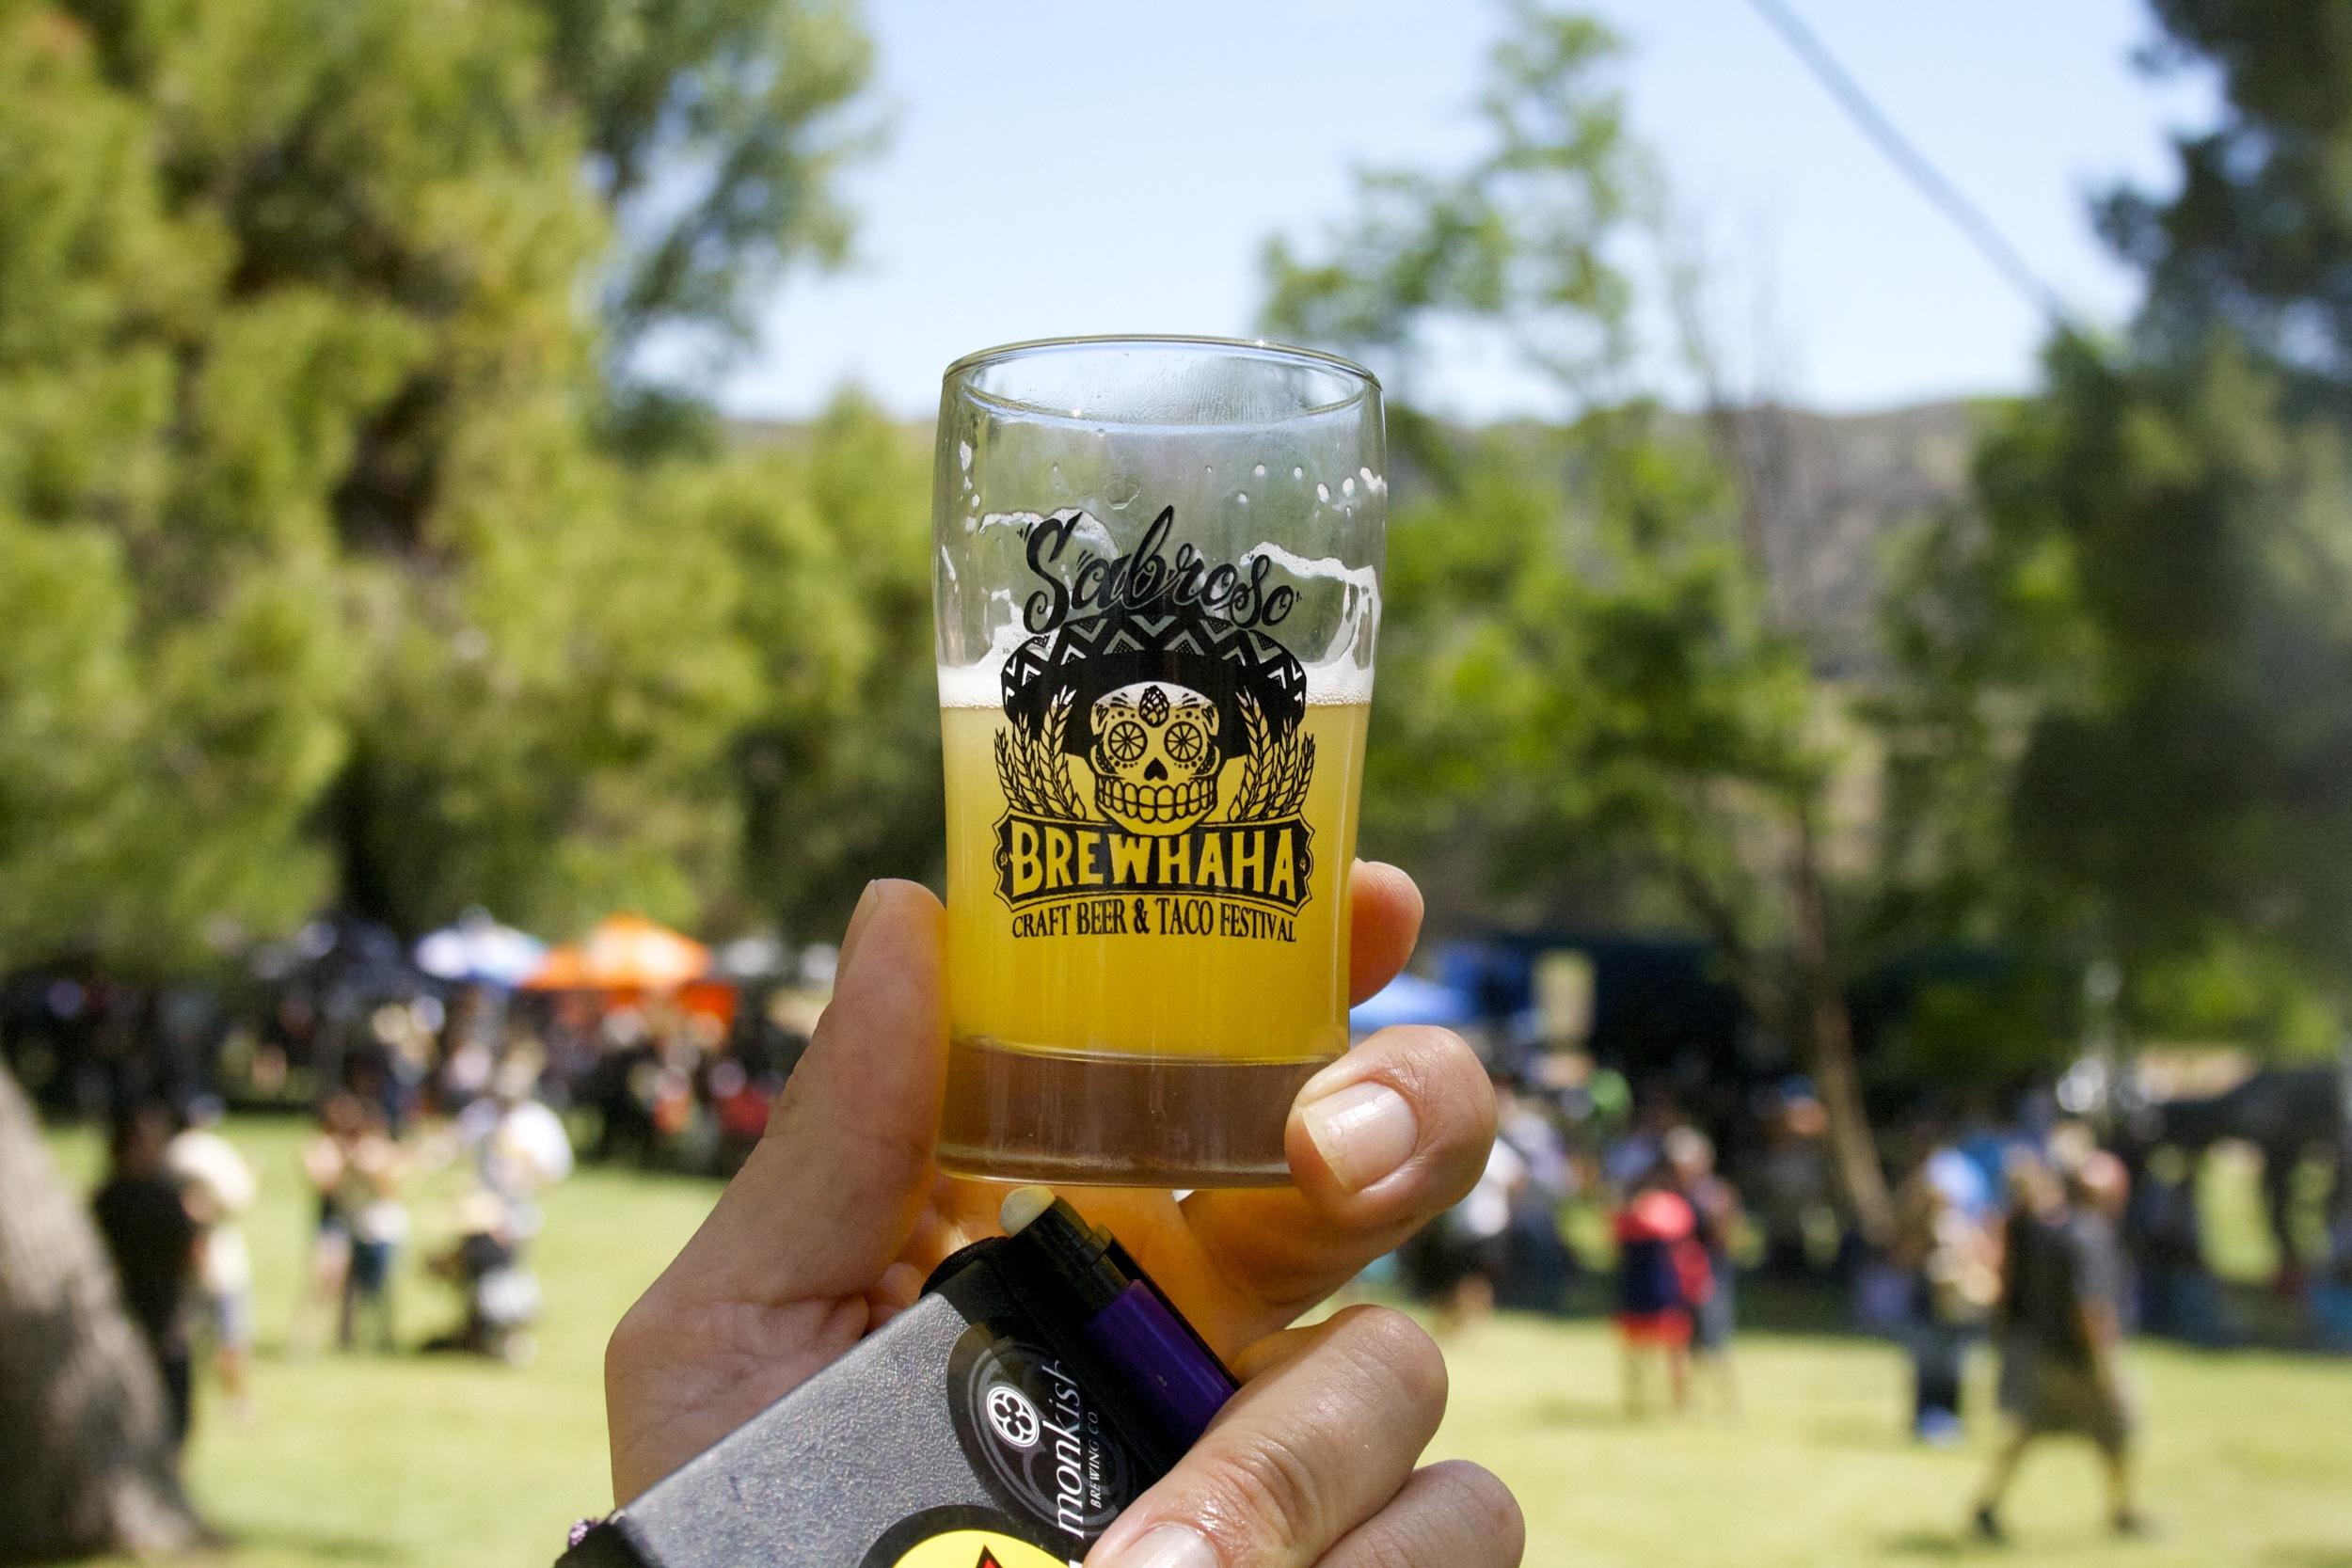 Requisite festival glass shot